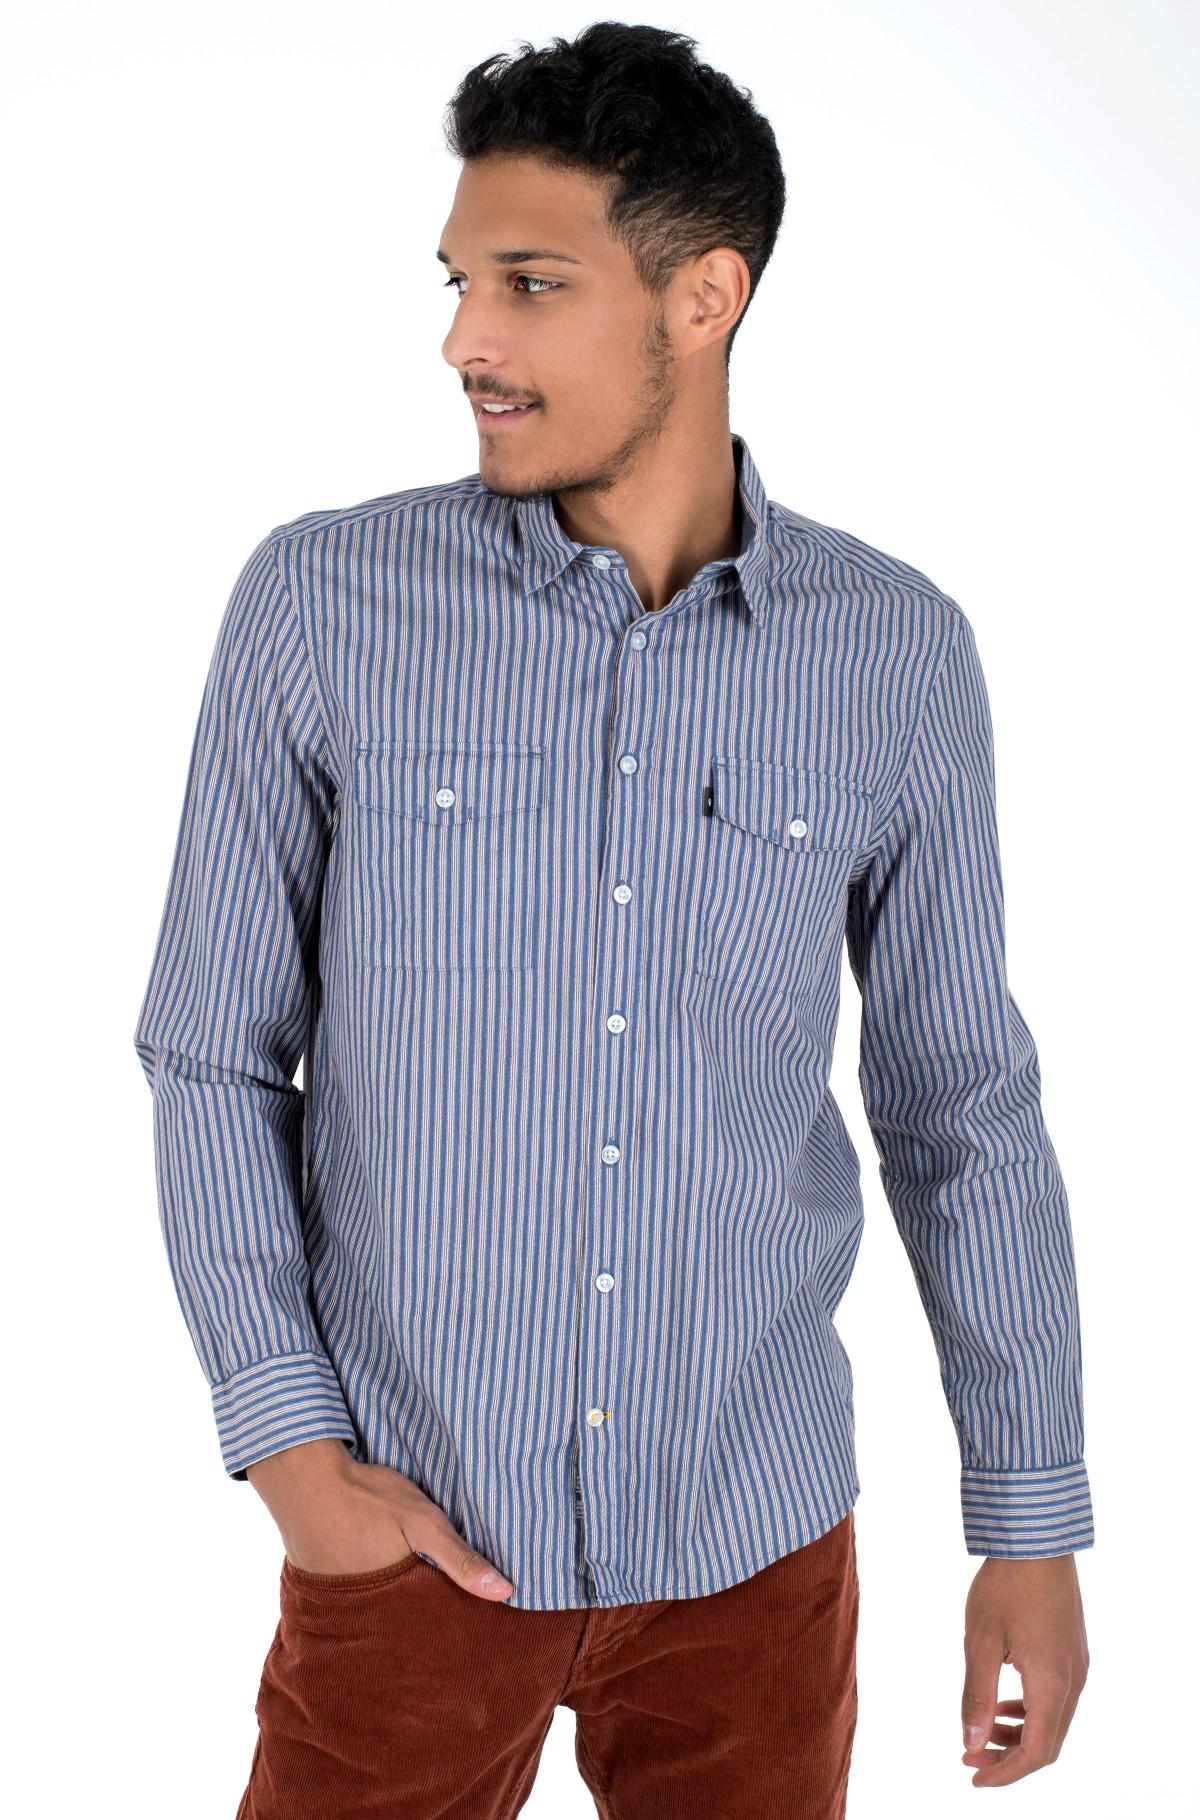 Marškiniai 409136/4S36-full-1